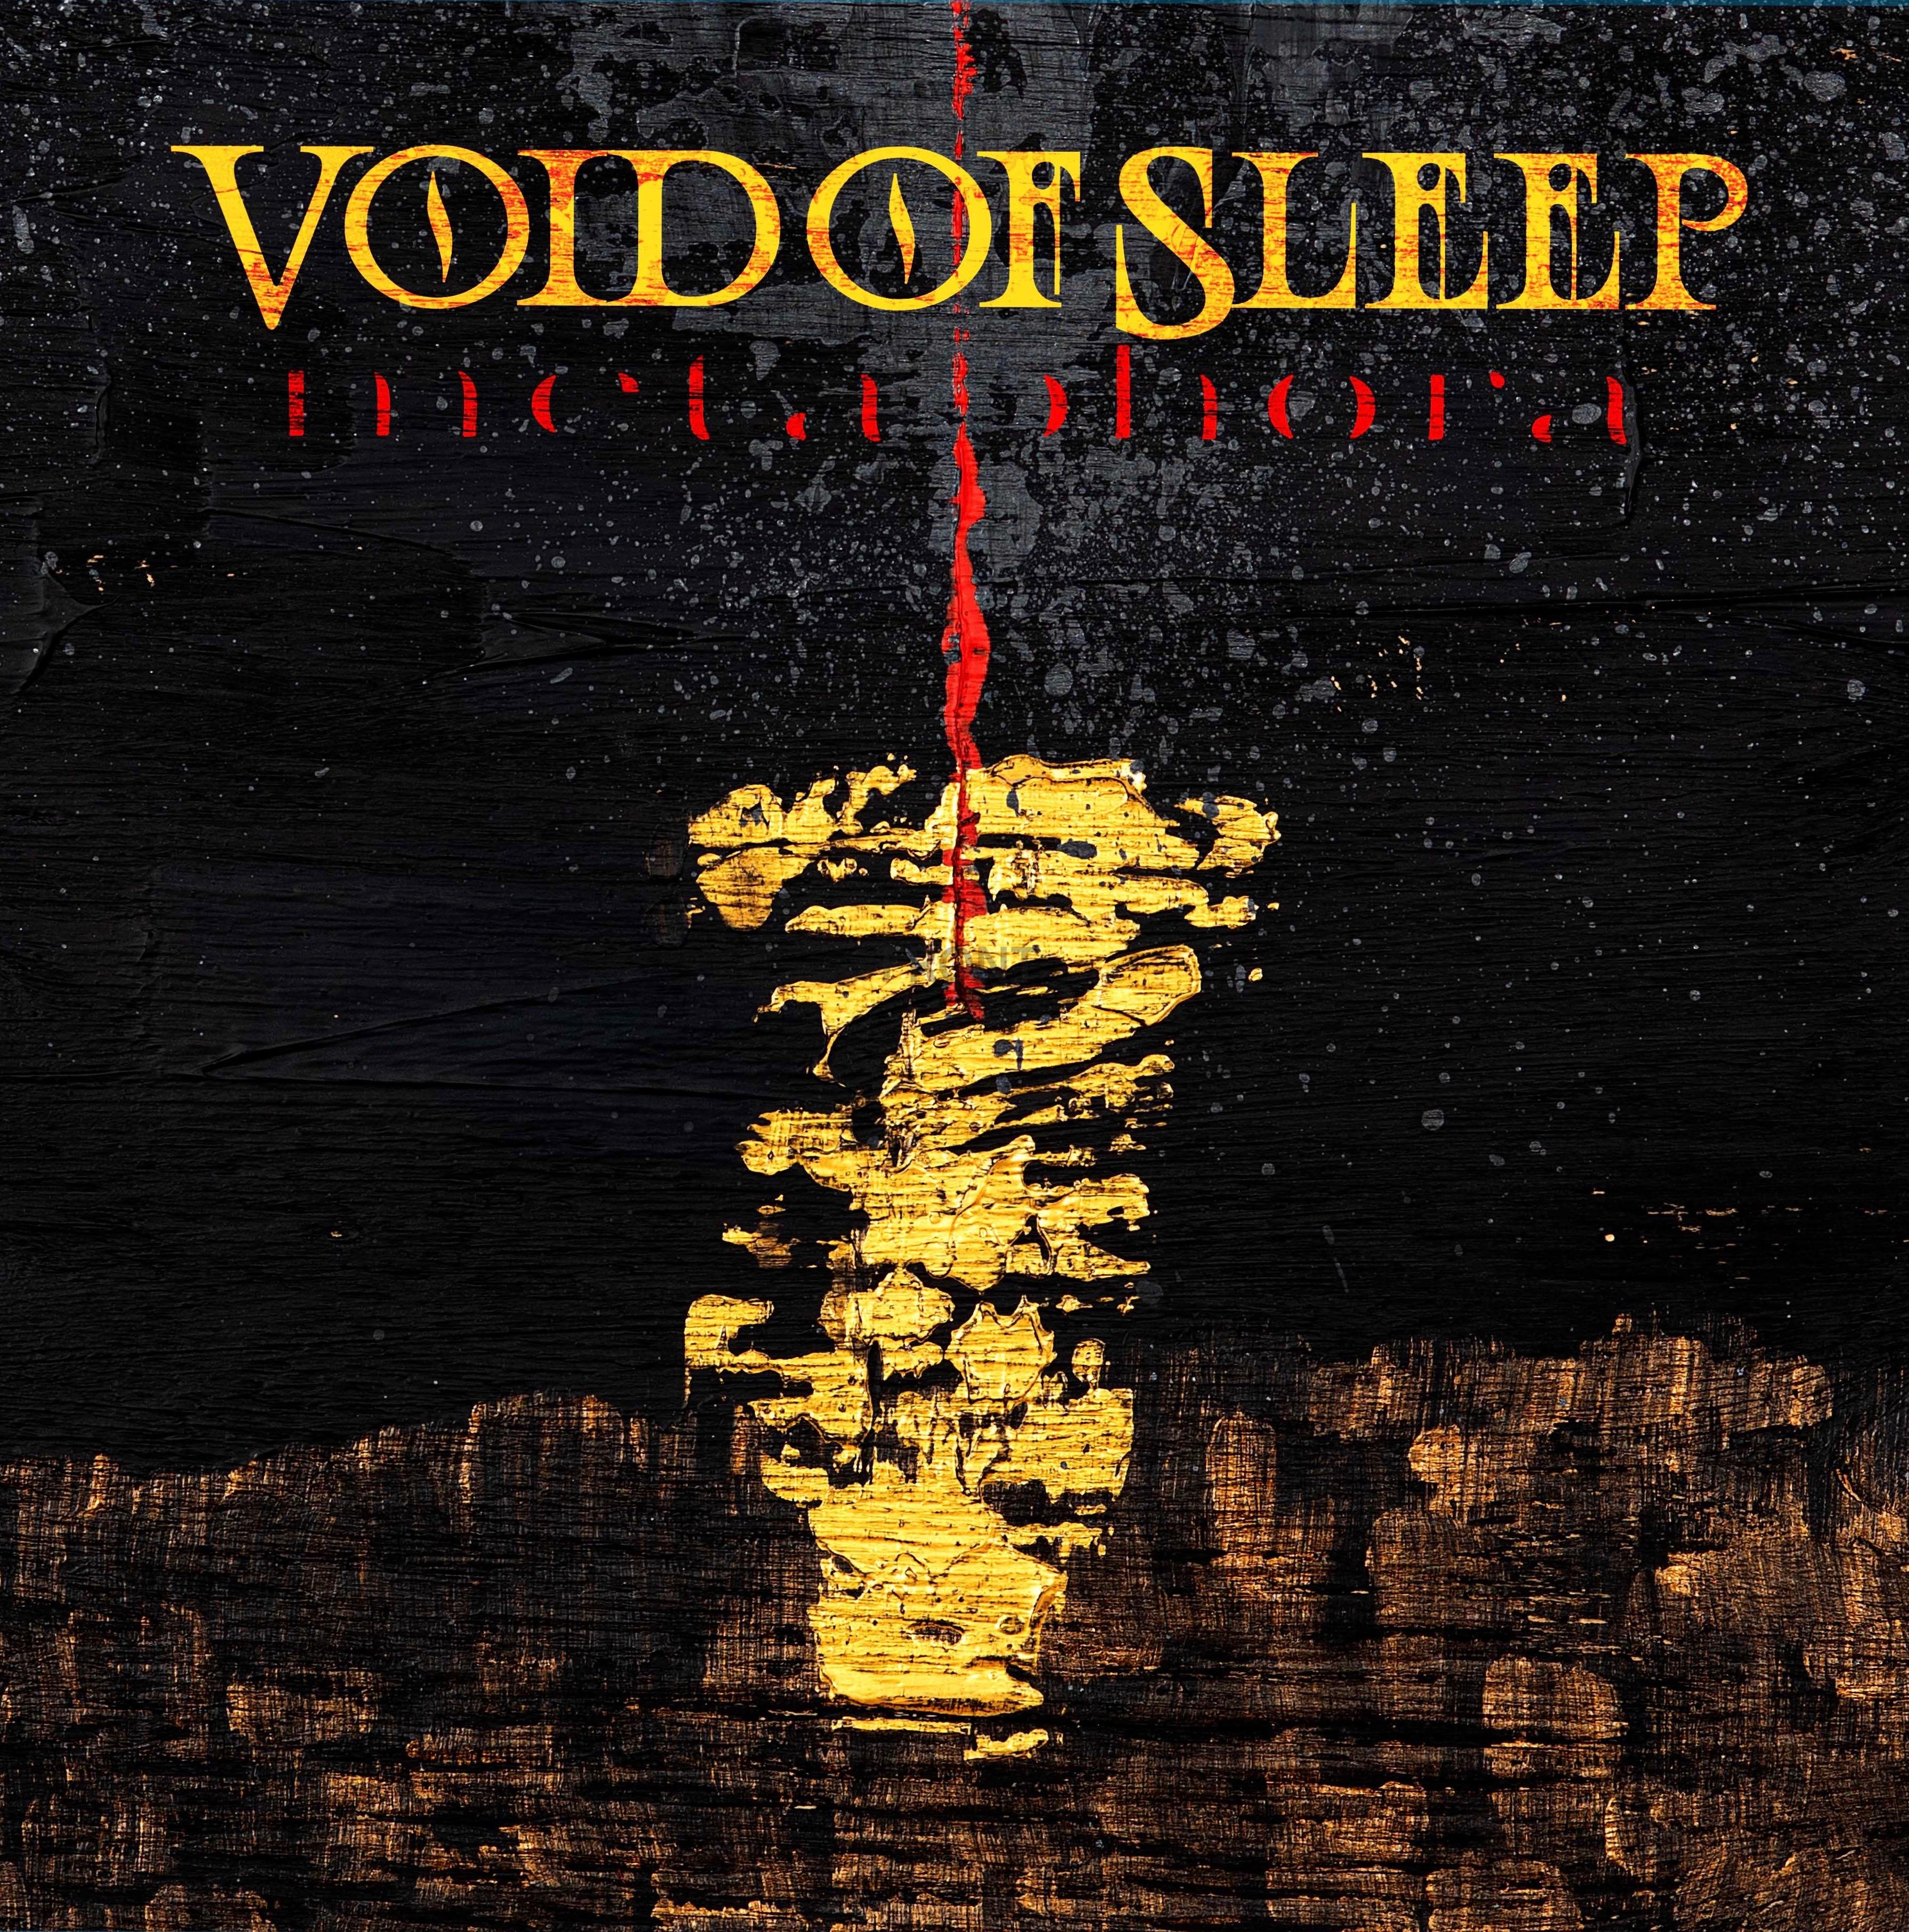 Void of Sleep Metaphora album cover, based on the painting Metahpora